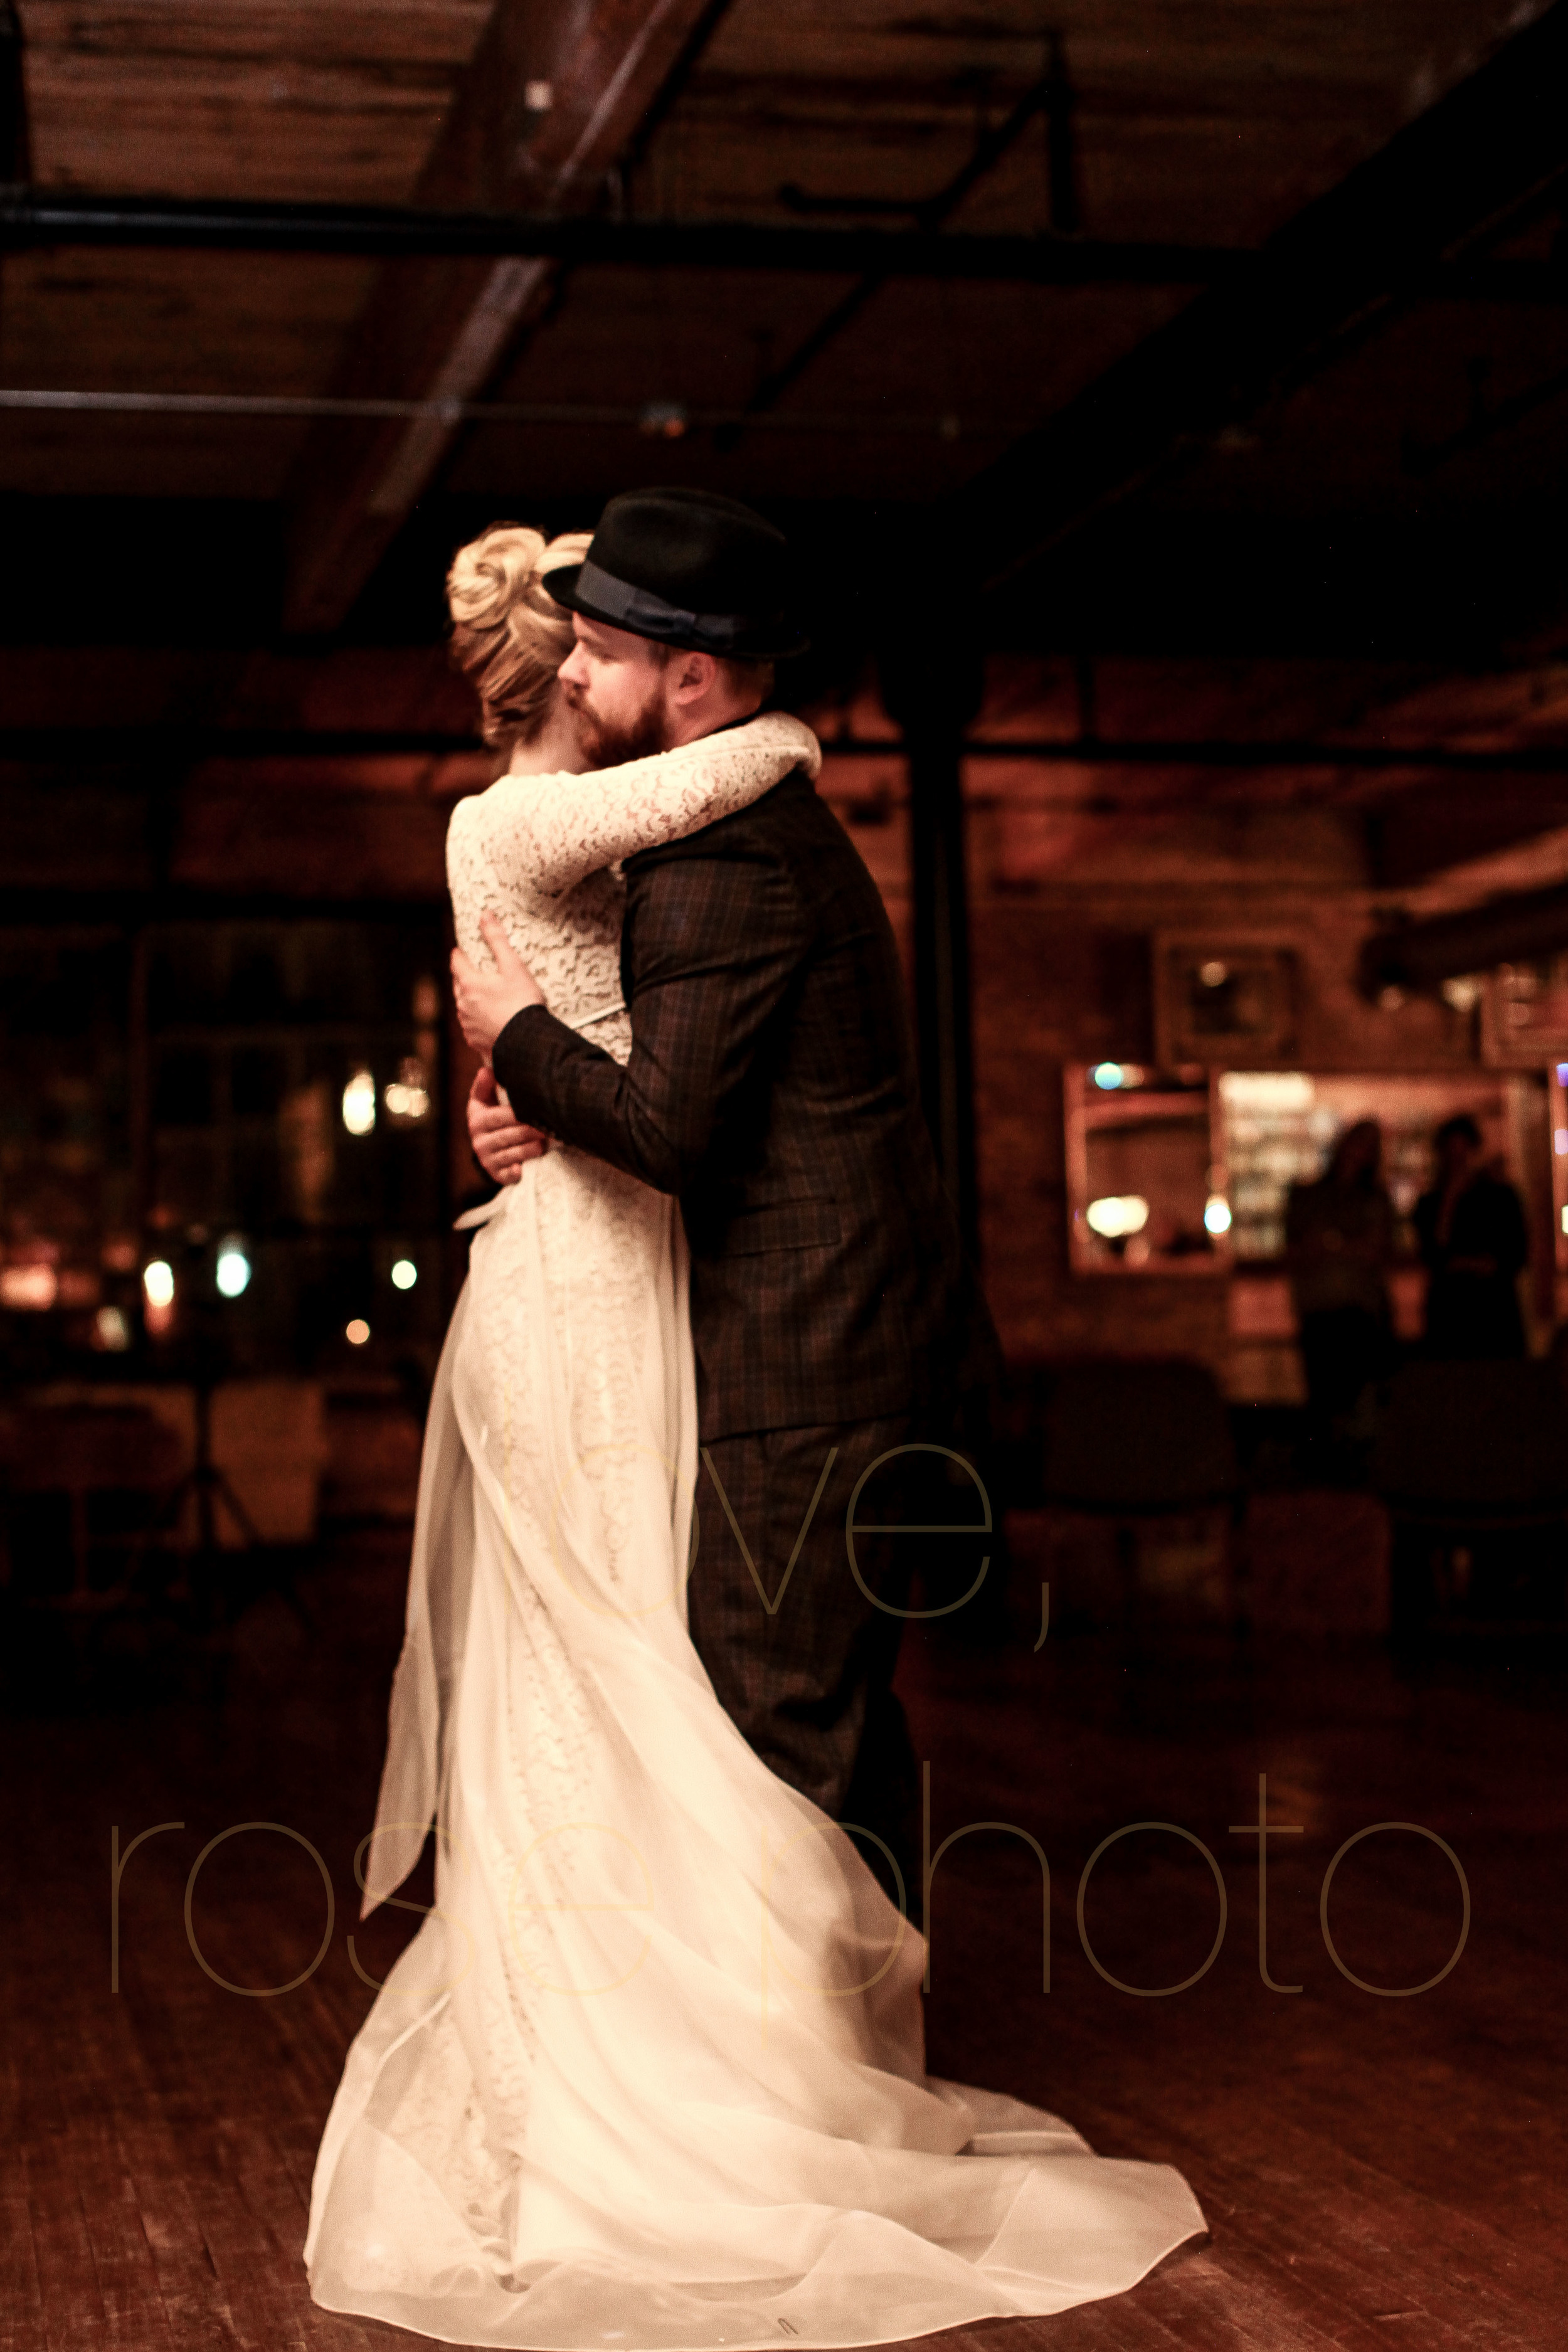 West Fulton Chicago Wedding Venue Salvage One photography enagement photos bride groom first dance-33.jpg